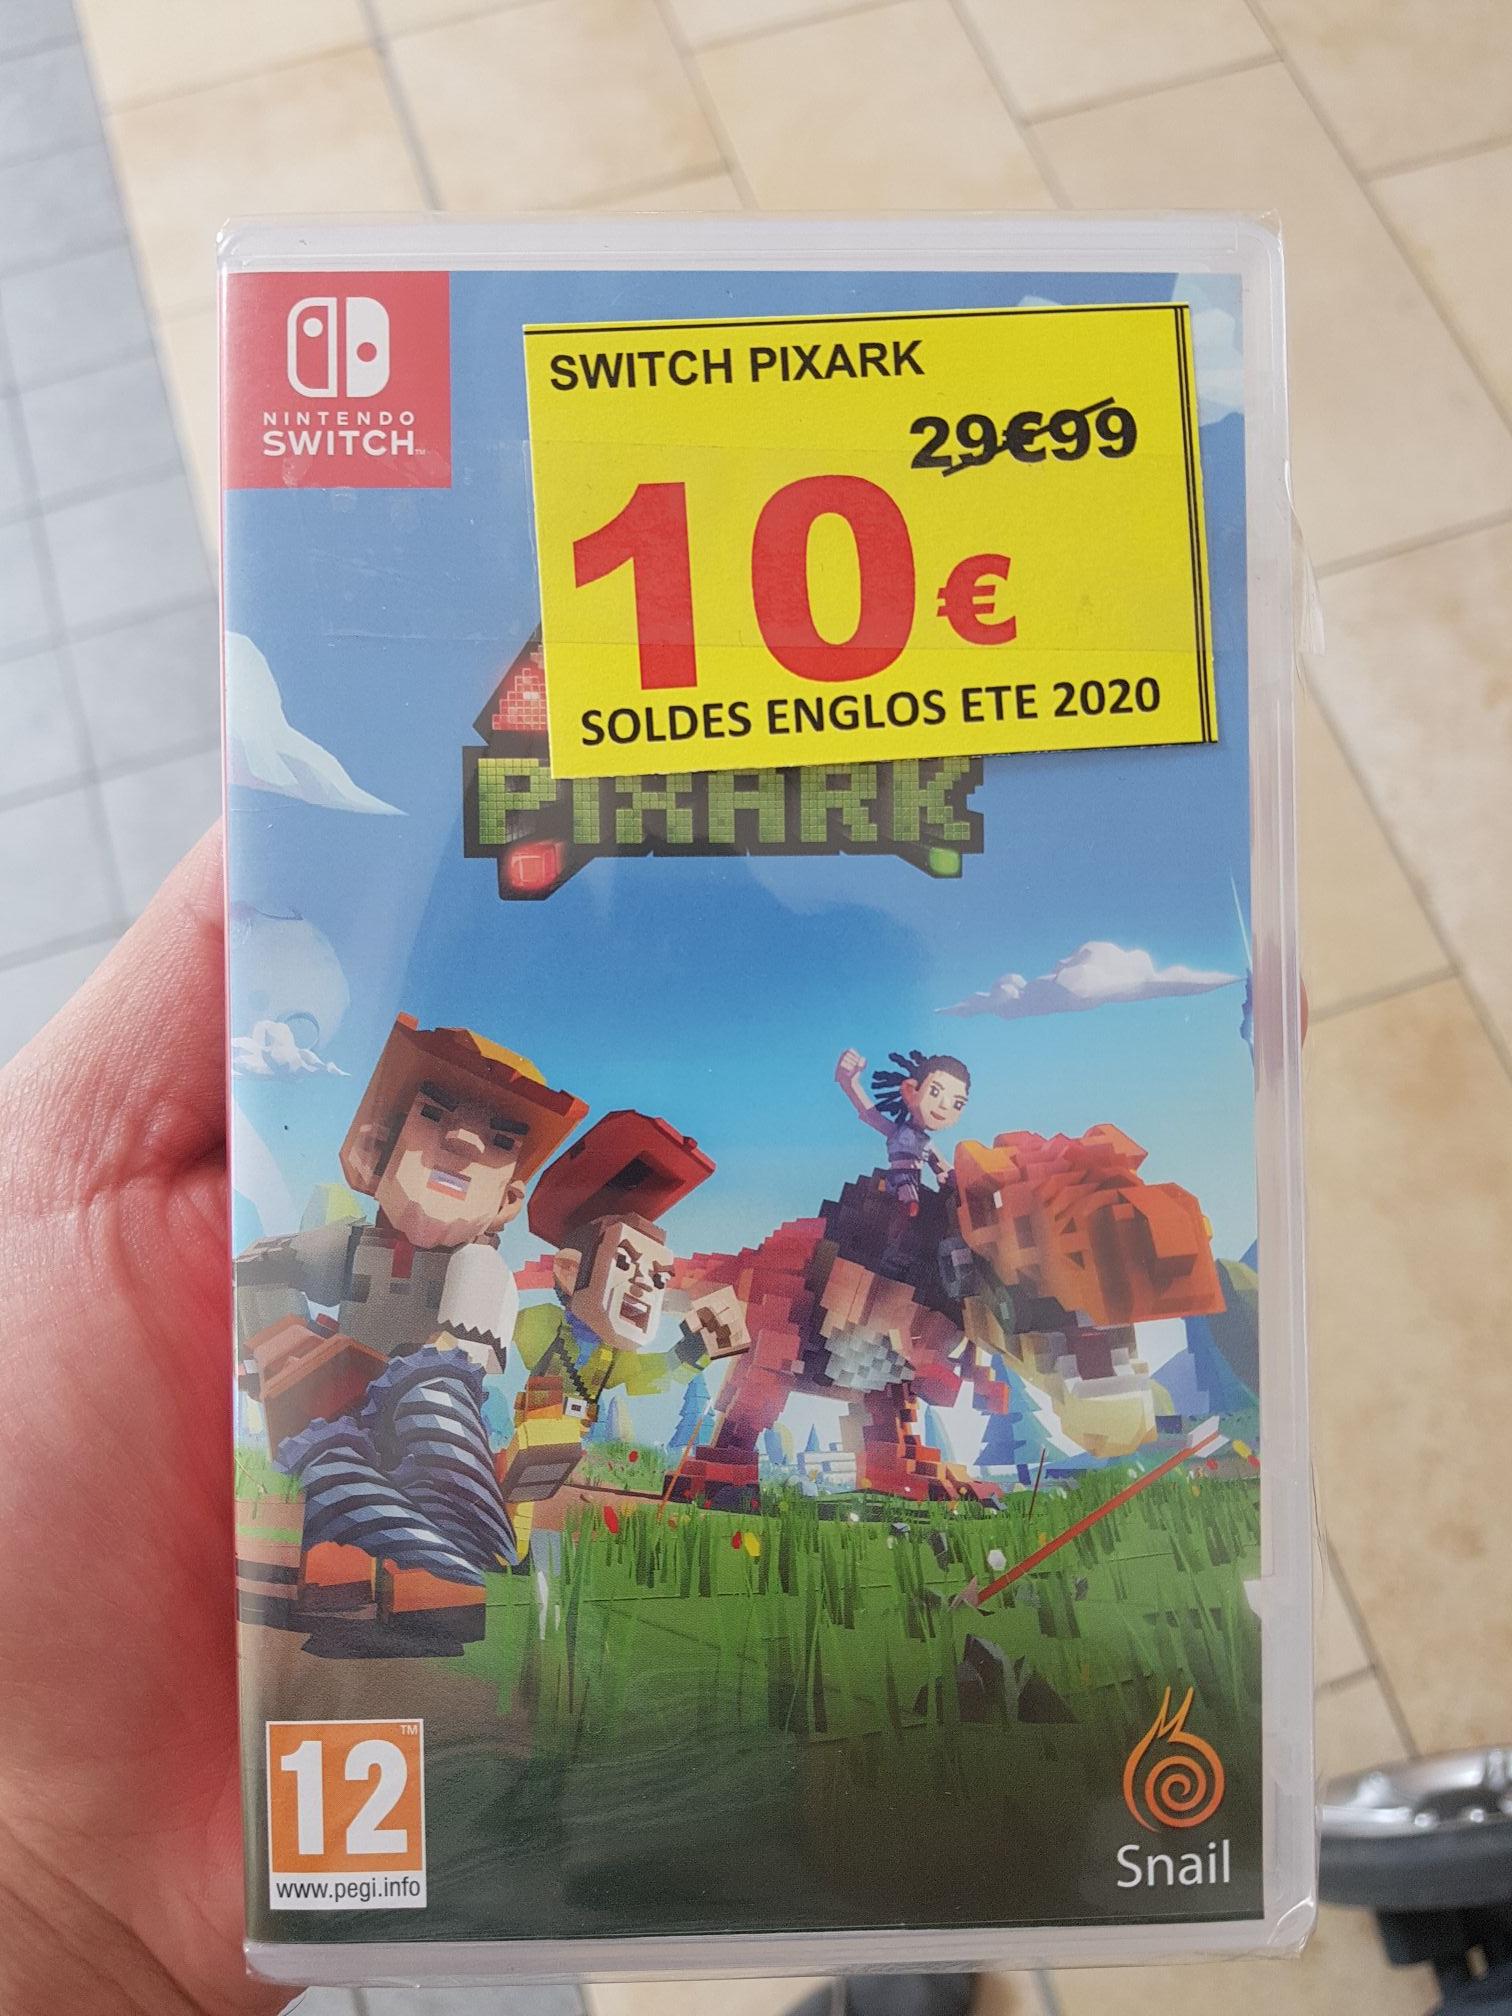 Pixark sur Nintendo Switch - Englos (59)